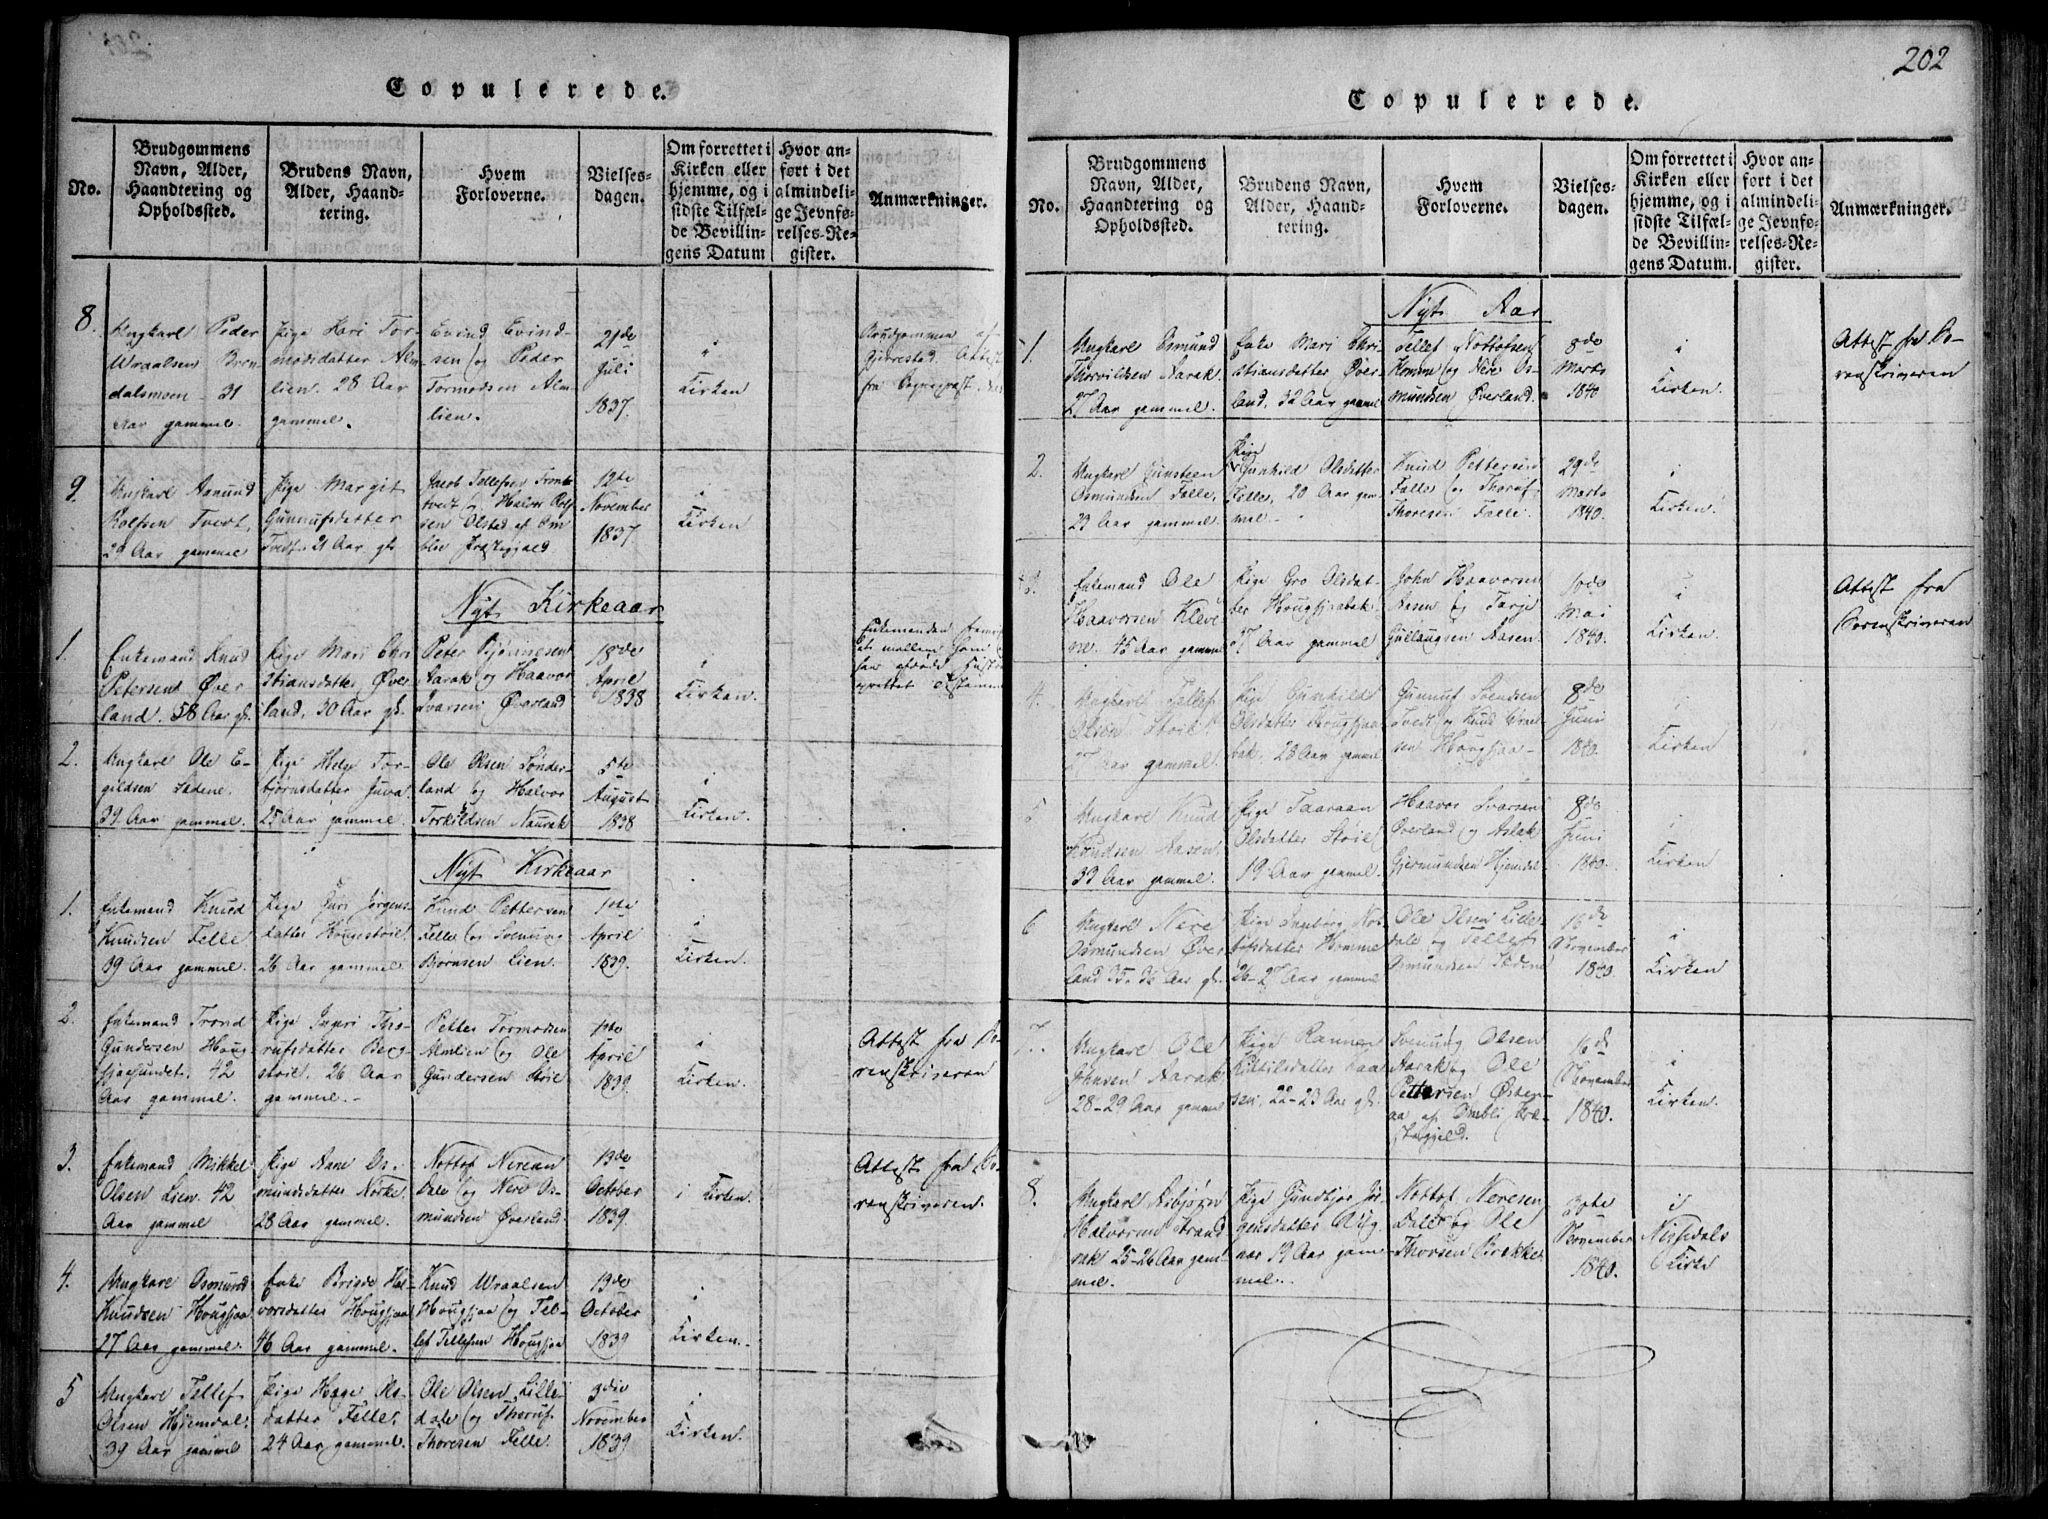 SAKO, Nissedal kirkebøker, F/Fb/L0001: Ministerialbok nr. II 1, 1814-1845, s. 202